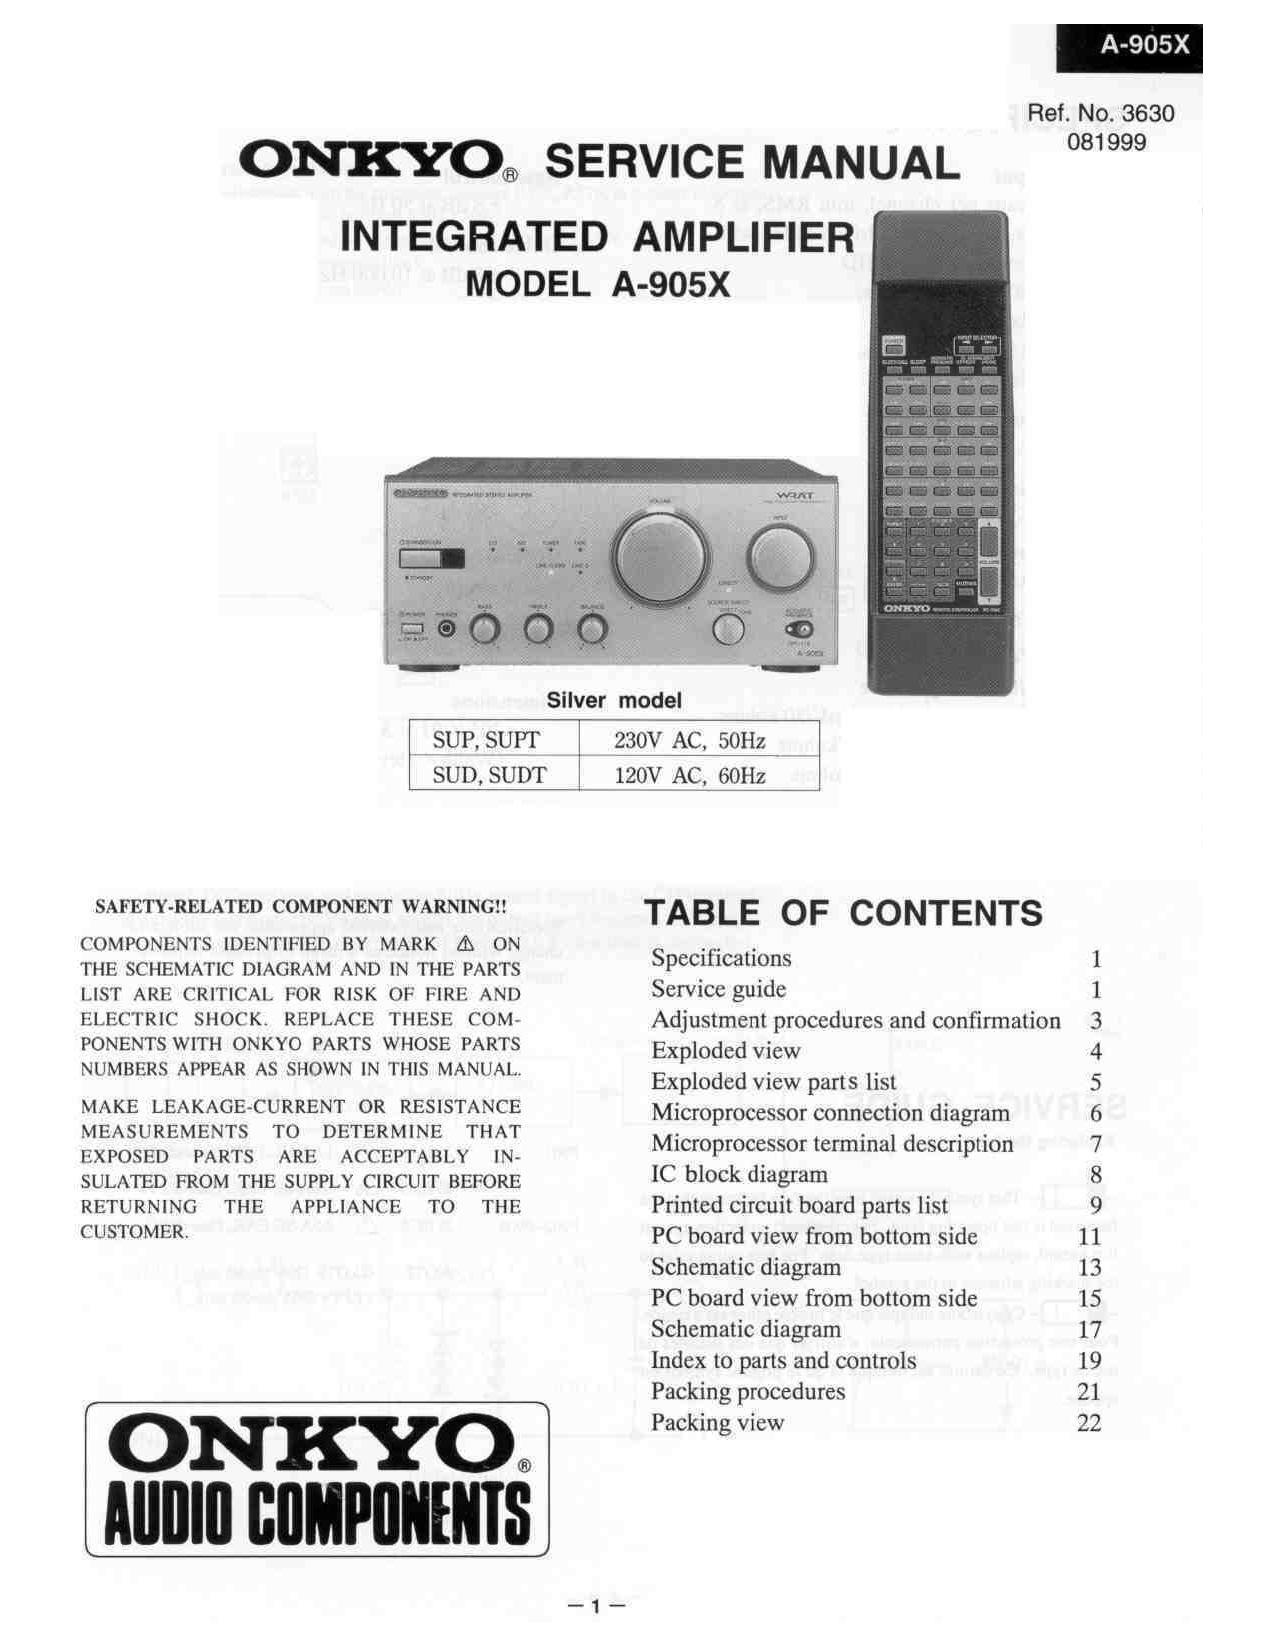 onkyo a 905 x service manual rh audioservicemanuals com onkyo 905 manual